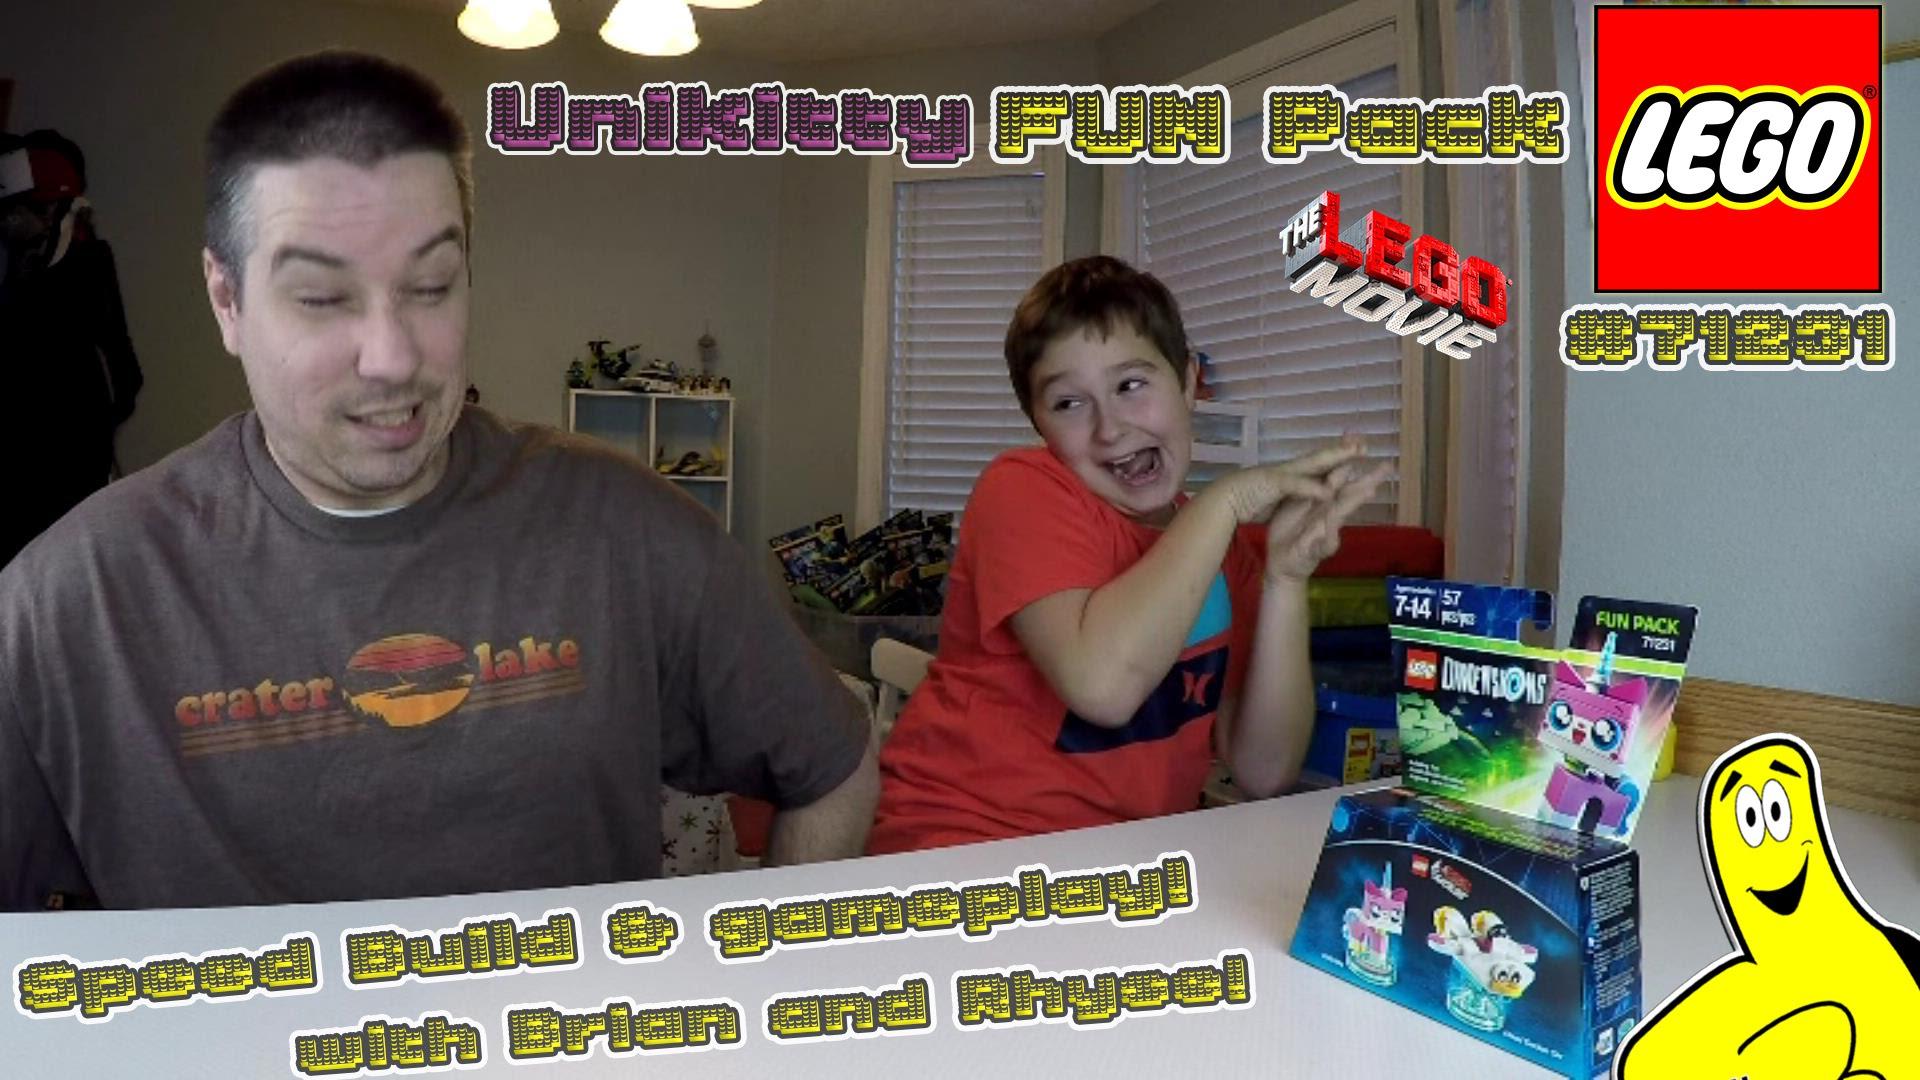 Lego Dimensions: #71231 Unikitty FUN Pack Unboxing/SpeedBuild/Gameplay – HTG